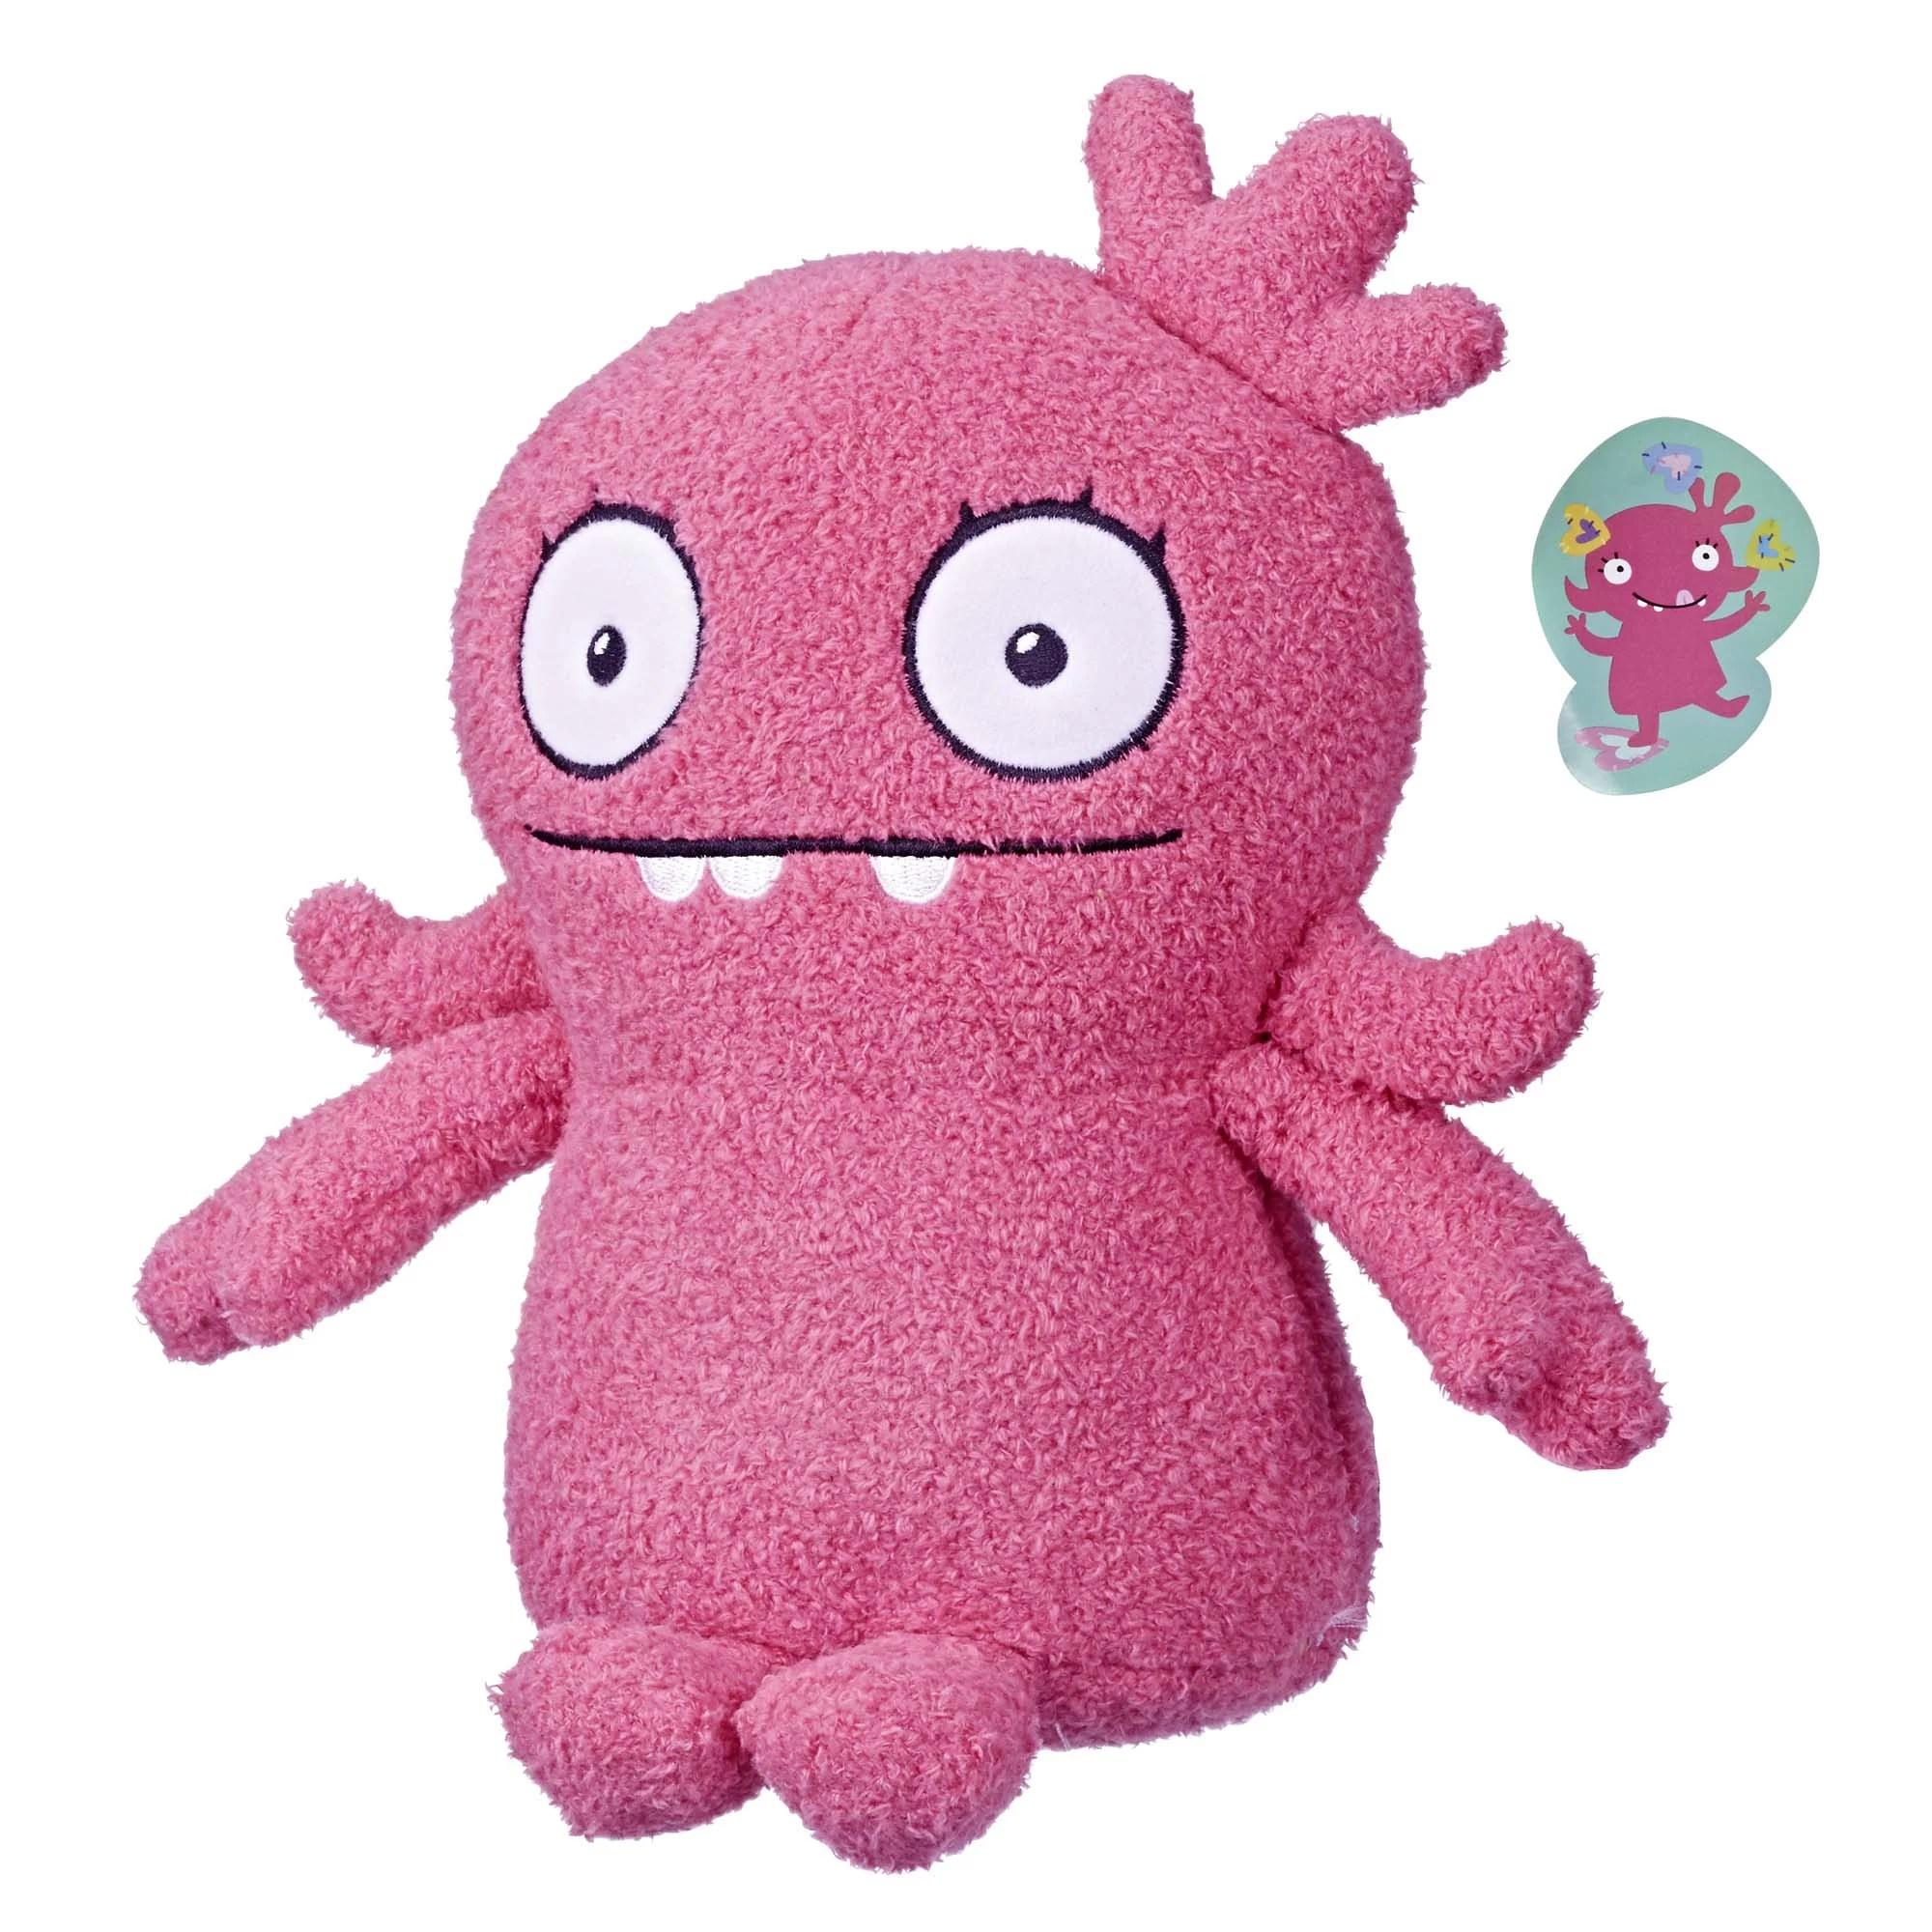 stuffed animals plush toys